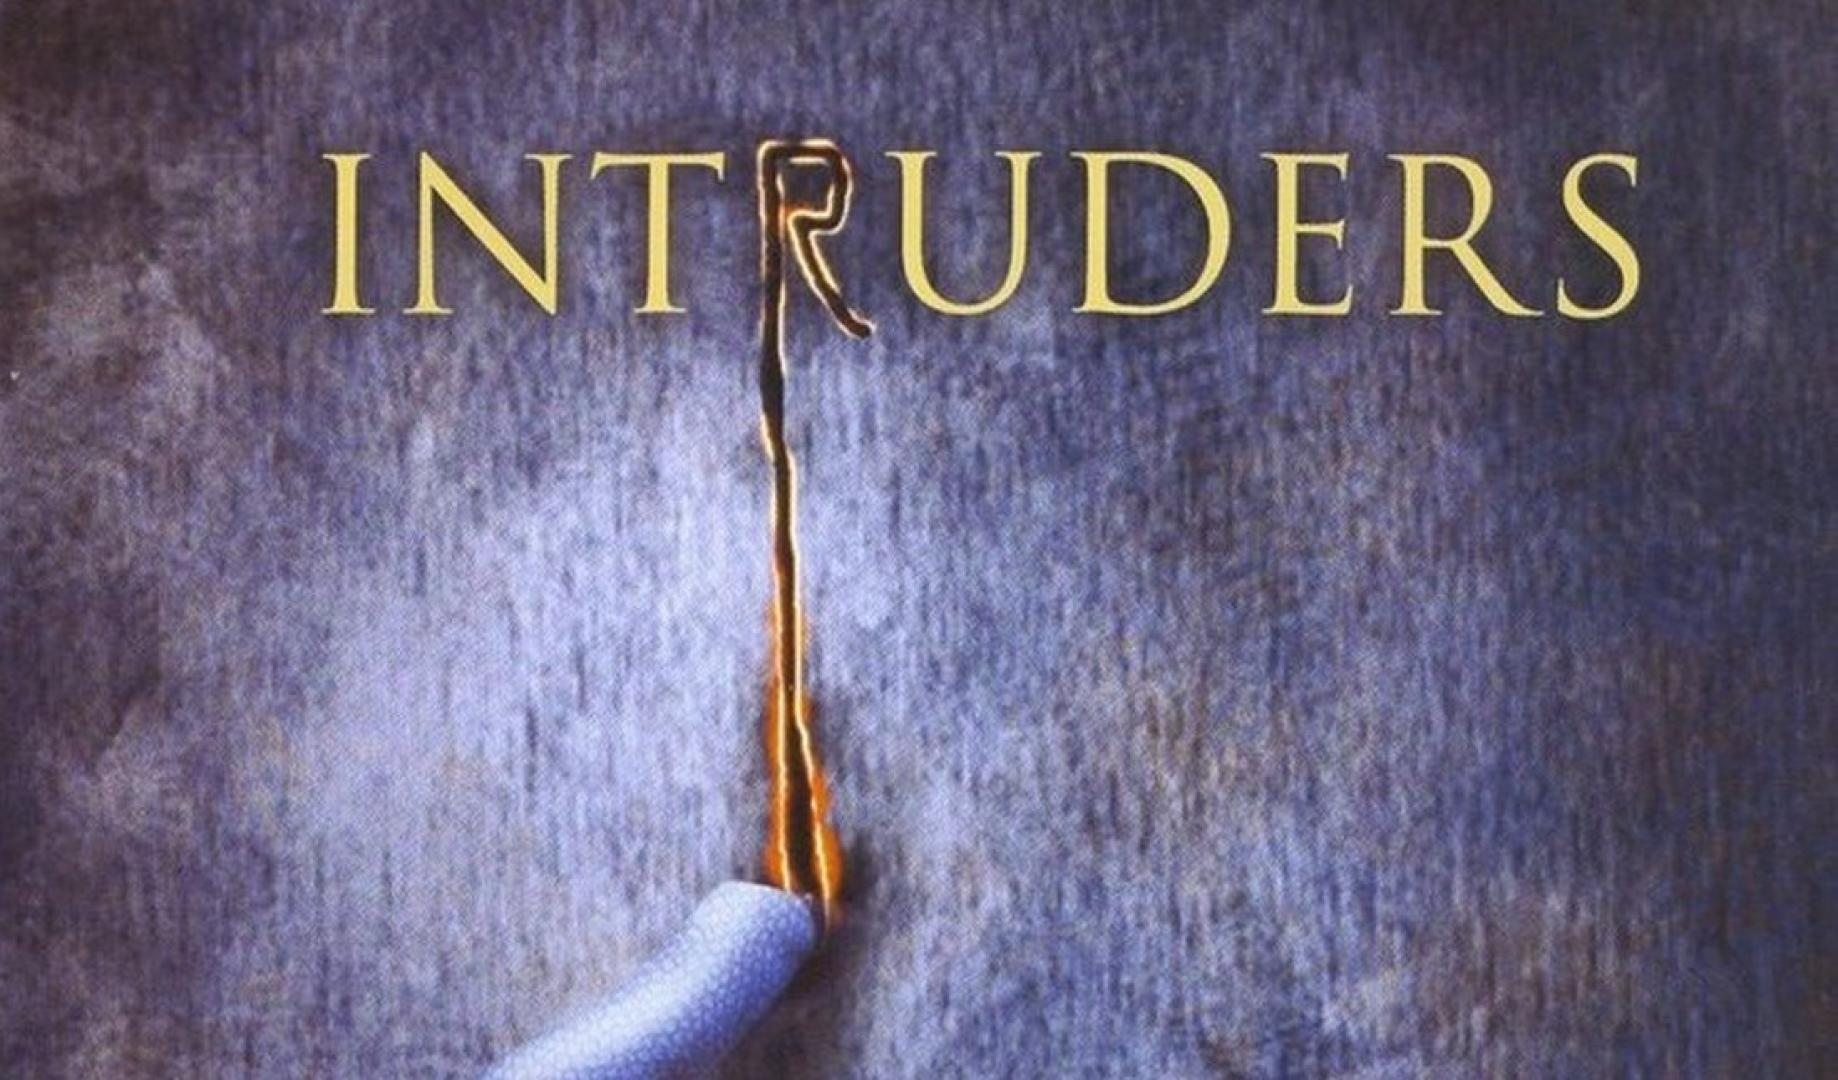 Intruders - Intruderek: Egy új faj születik (1992)